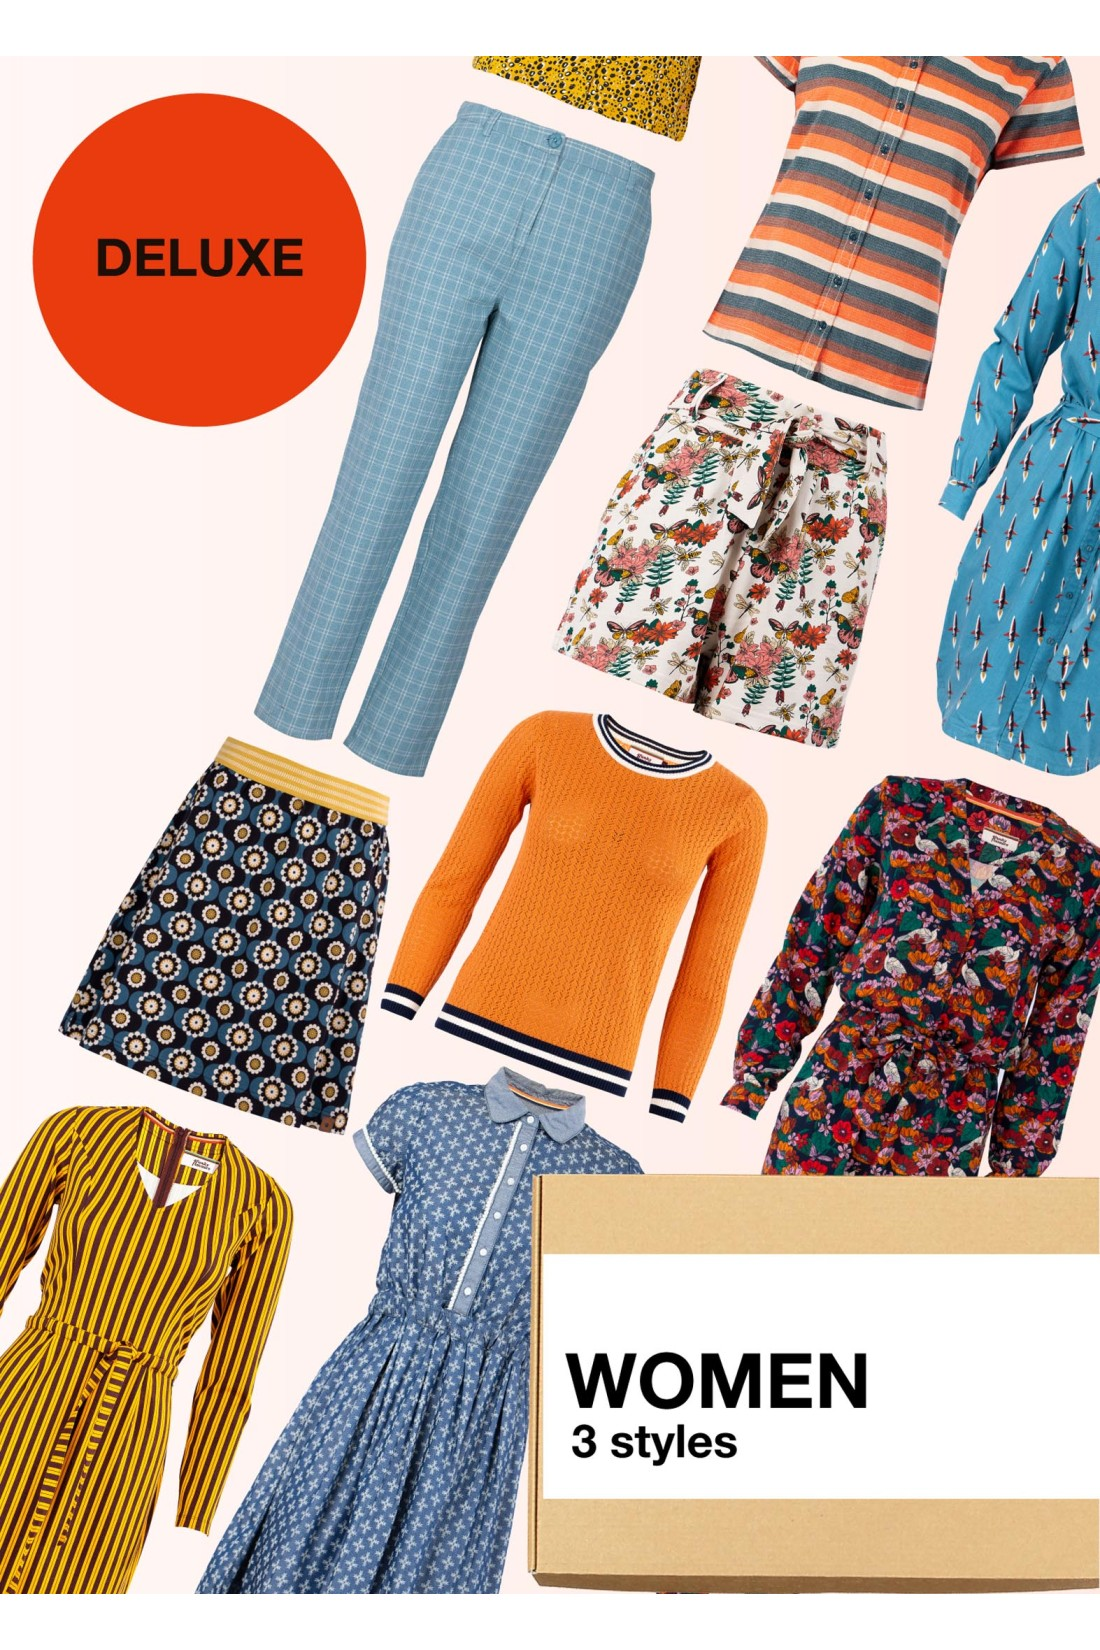 Surprise Box Women - 3 Styles Deluxe